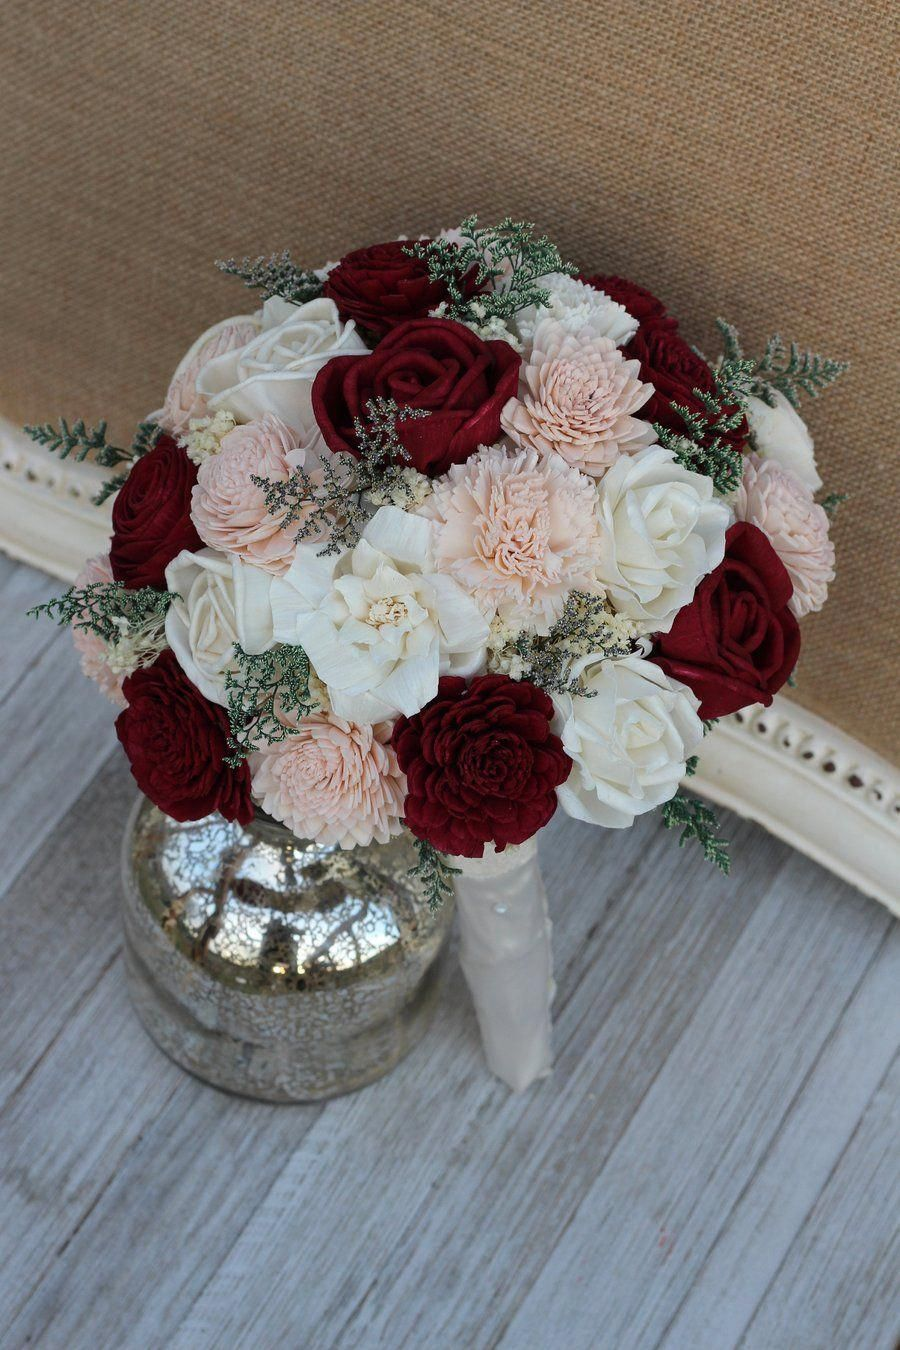 Burgundy Blush Pink Ivory Sola Wood Bridal Bouquet Maroon Burgundy Wedding Flowers Bridal Bouquets Burgundy Wedding Flowers Wedding Flowers Bridal Bouquets